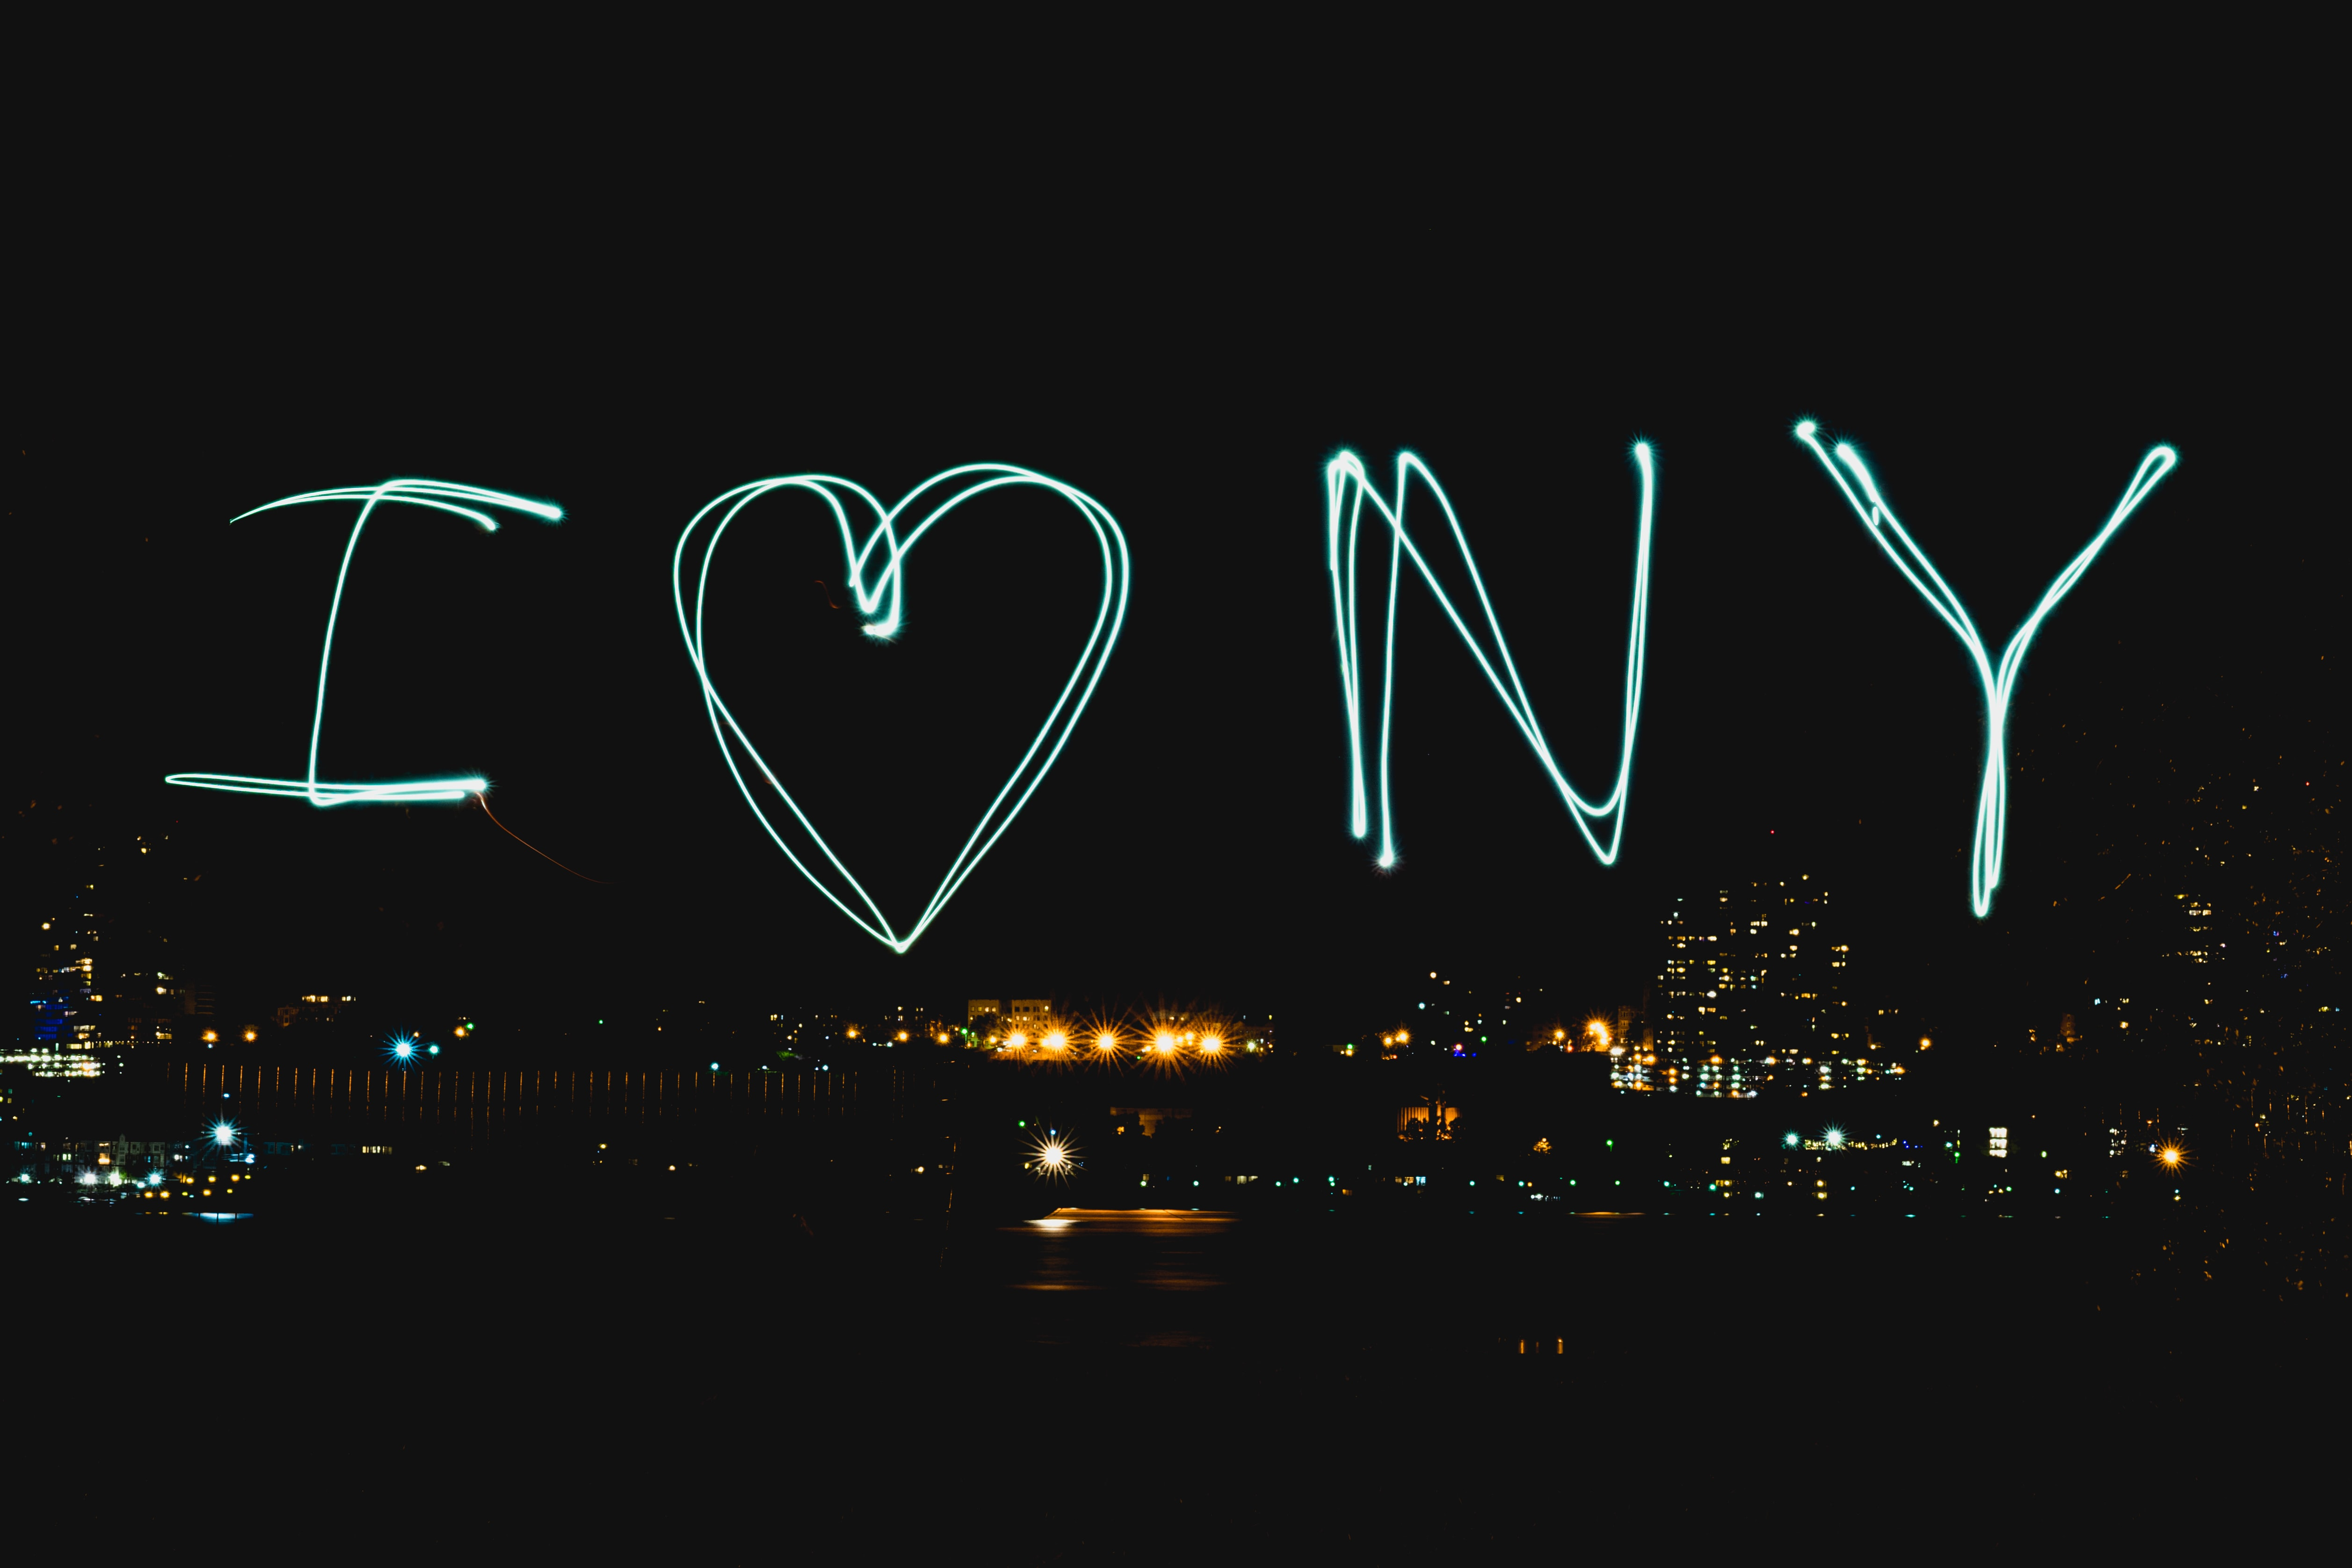 I love New York text